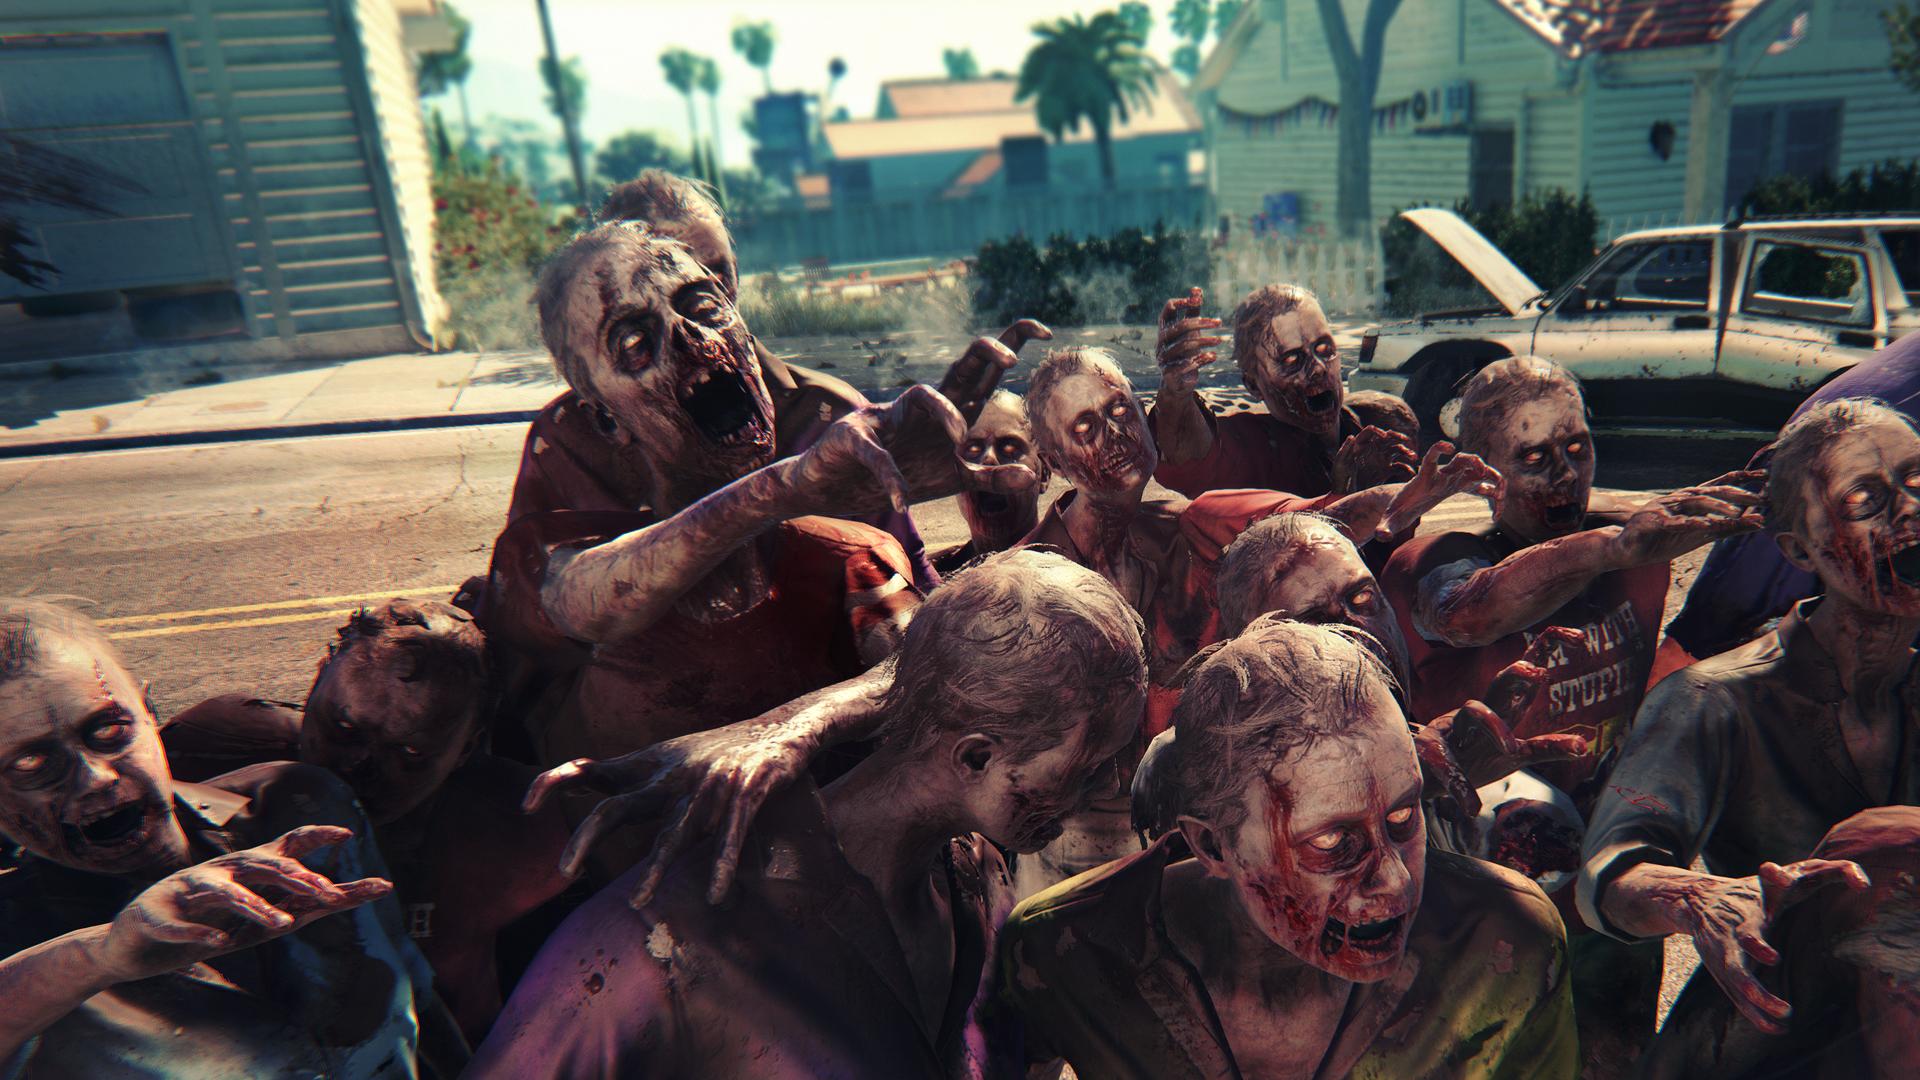 Dead Island 2 lives, new developer announced